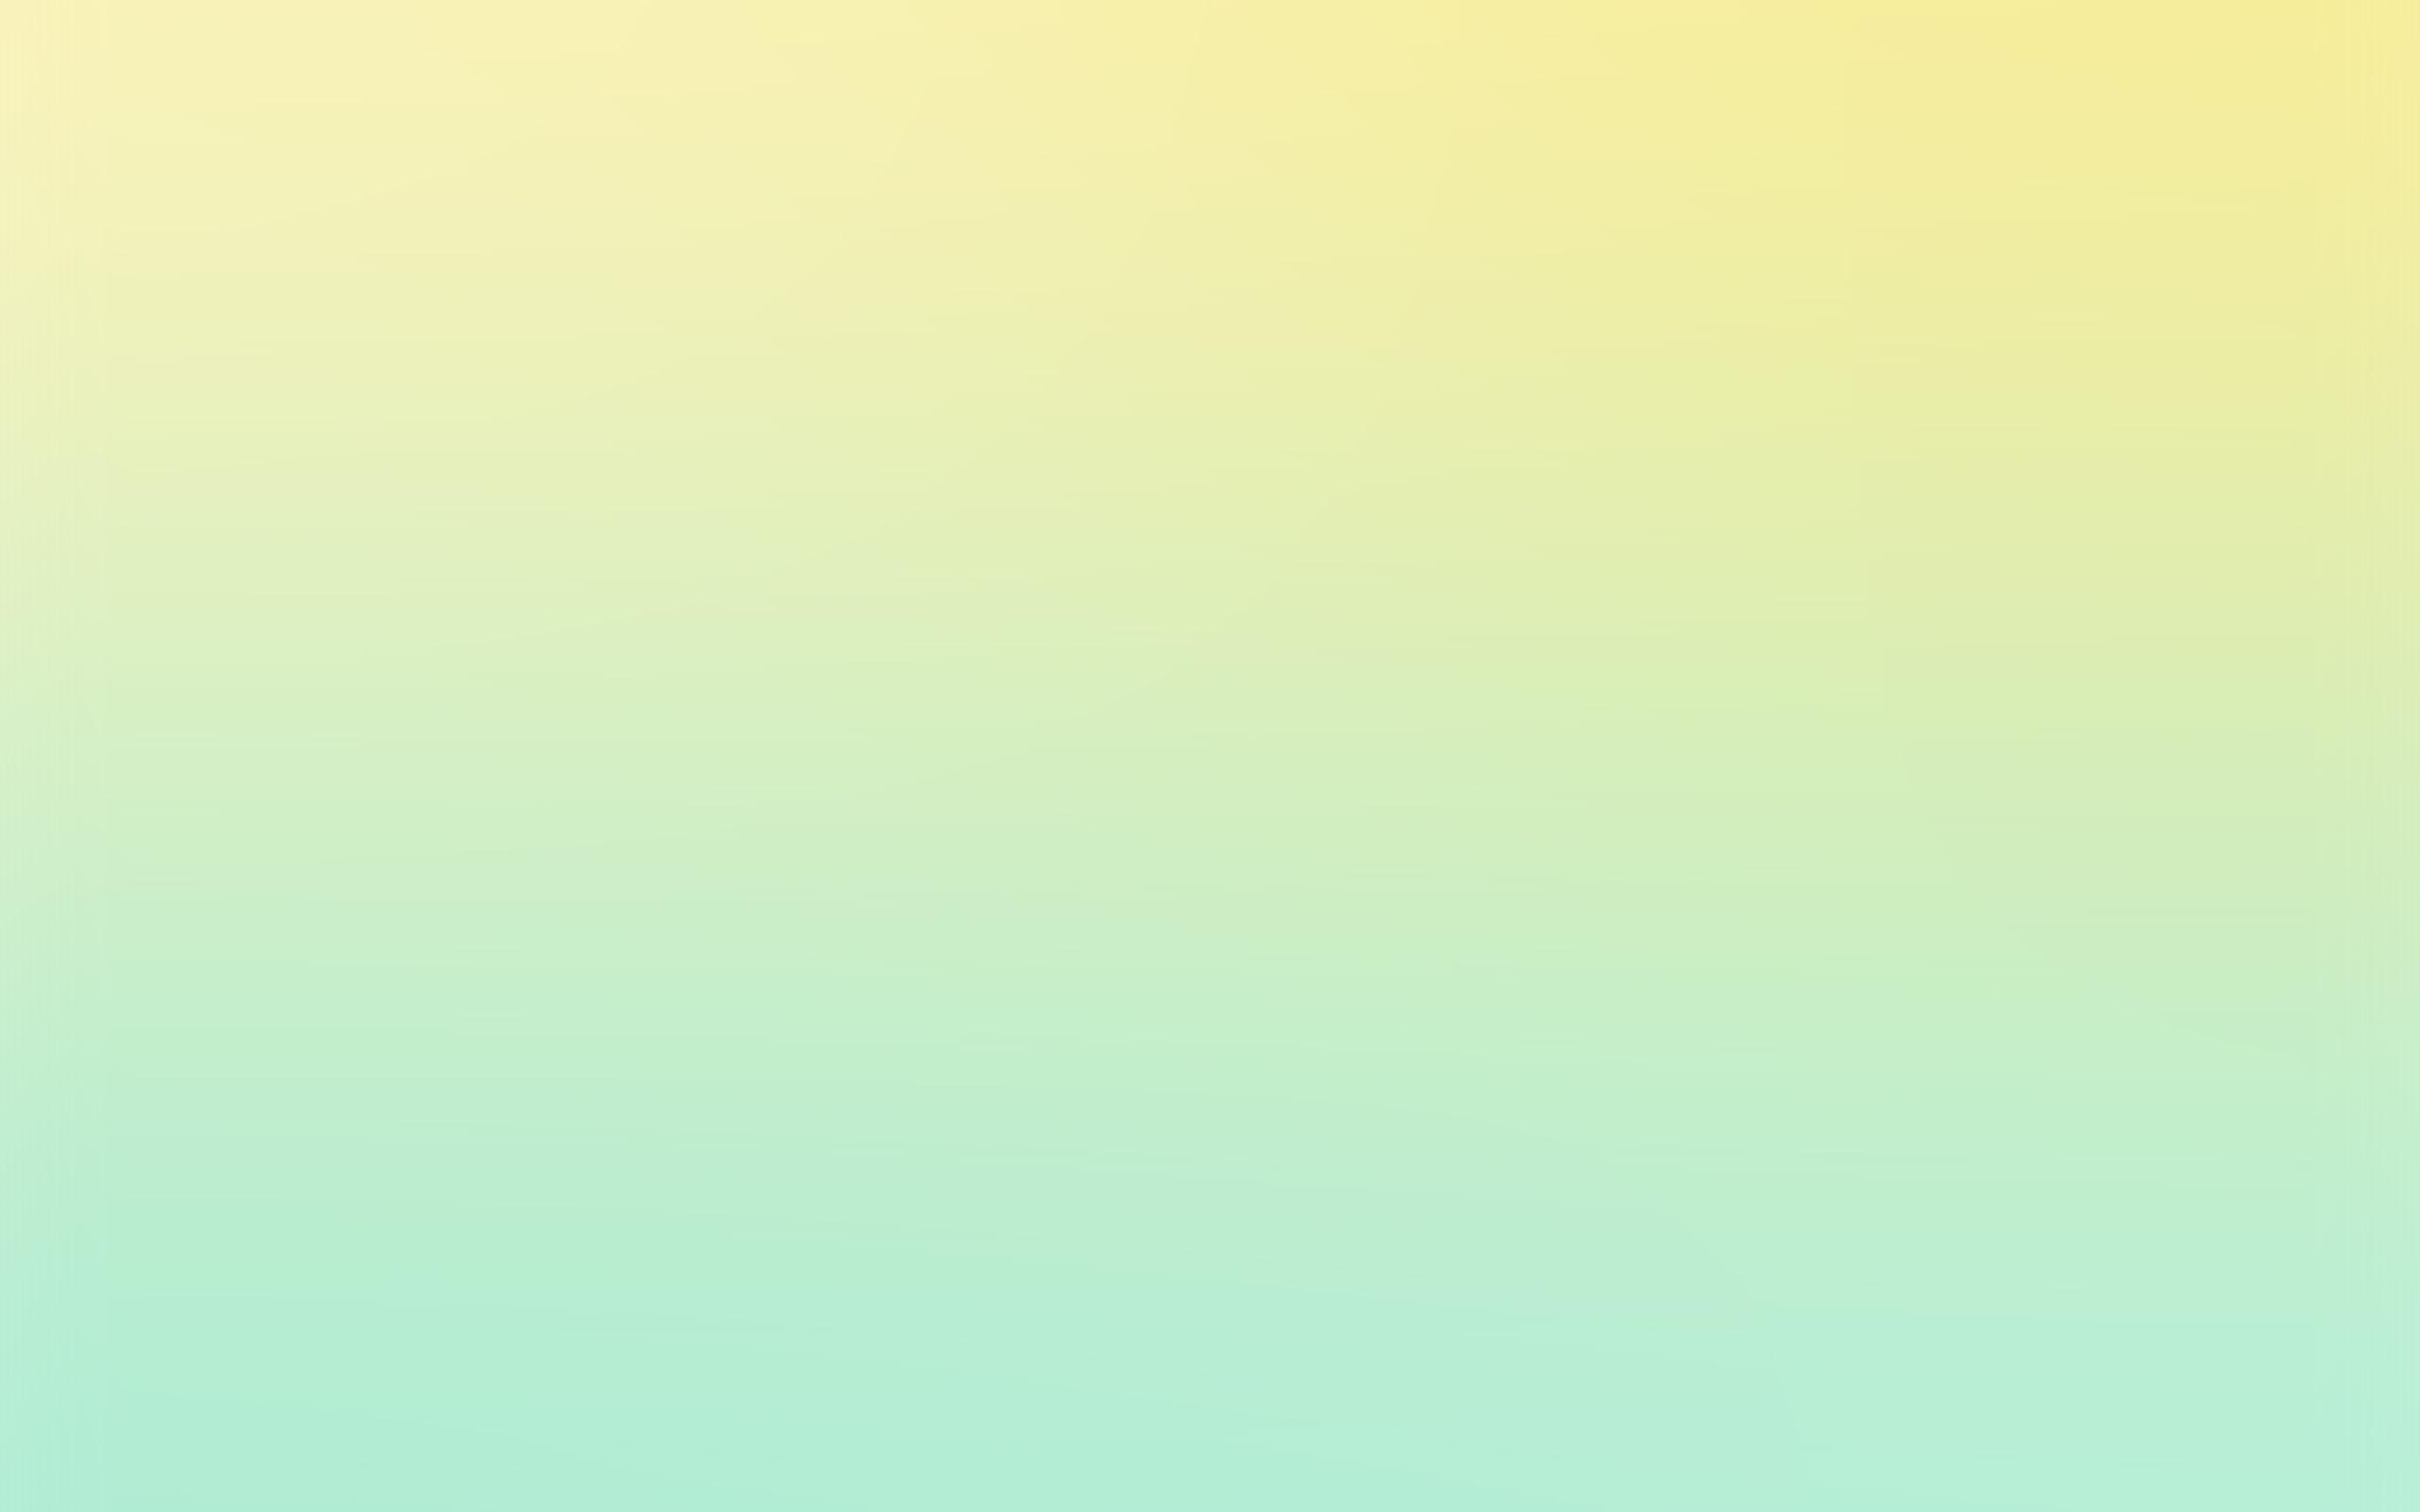 wallpaper for desktop, laptop   sl91-yellow-green-pastel ...